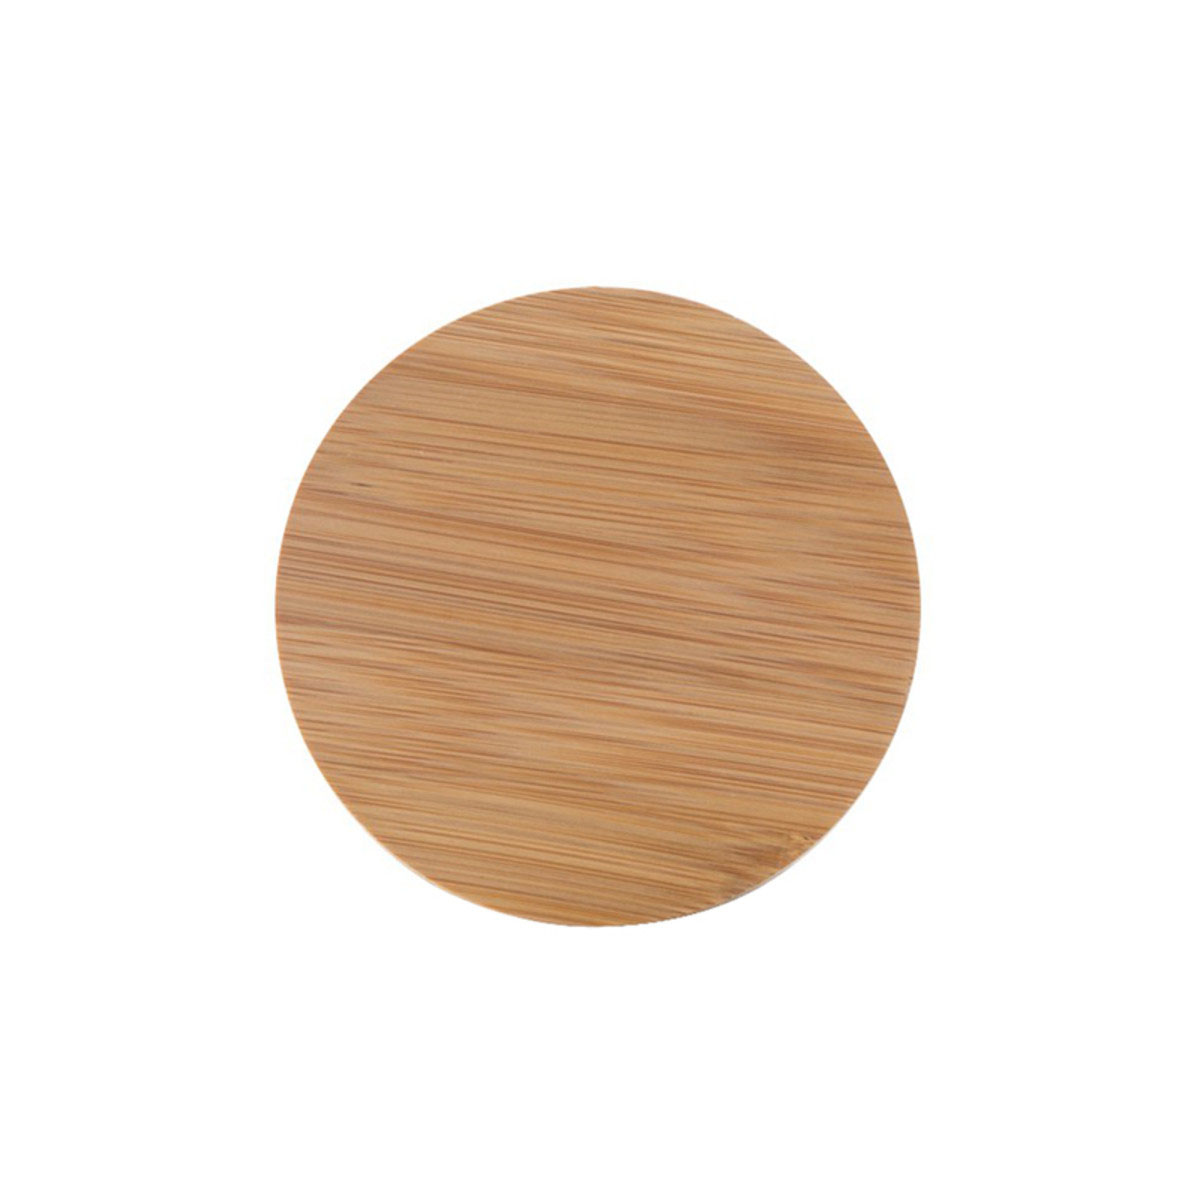 Bamboo Lid For 2.5oz Premium Glass Jar (200 Qty.)